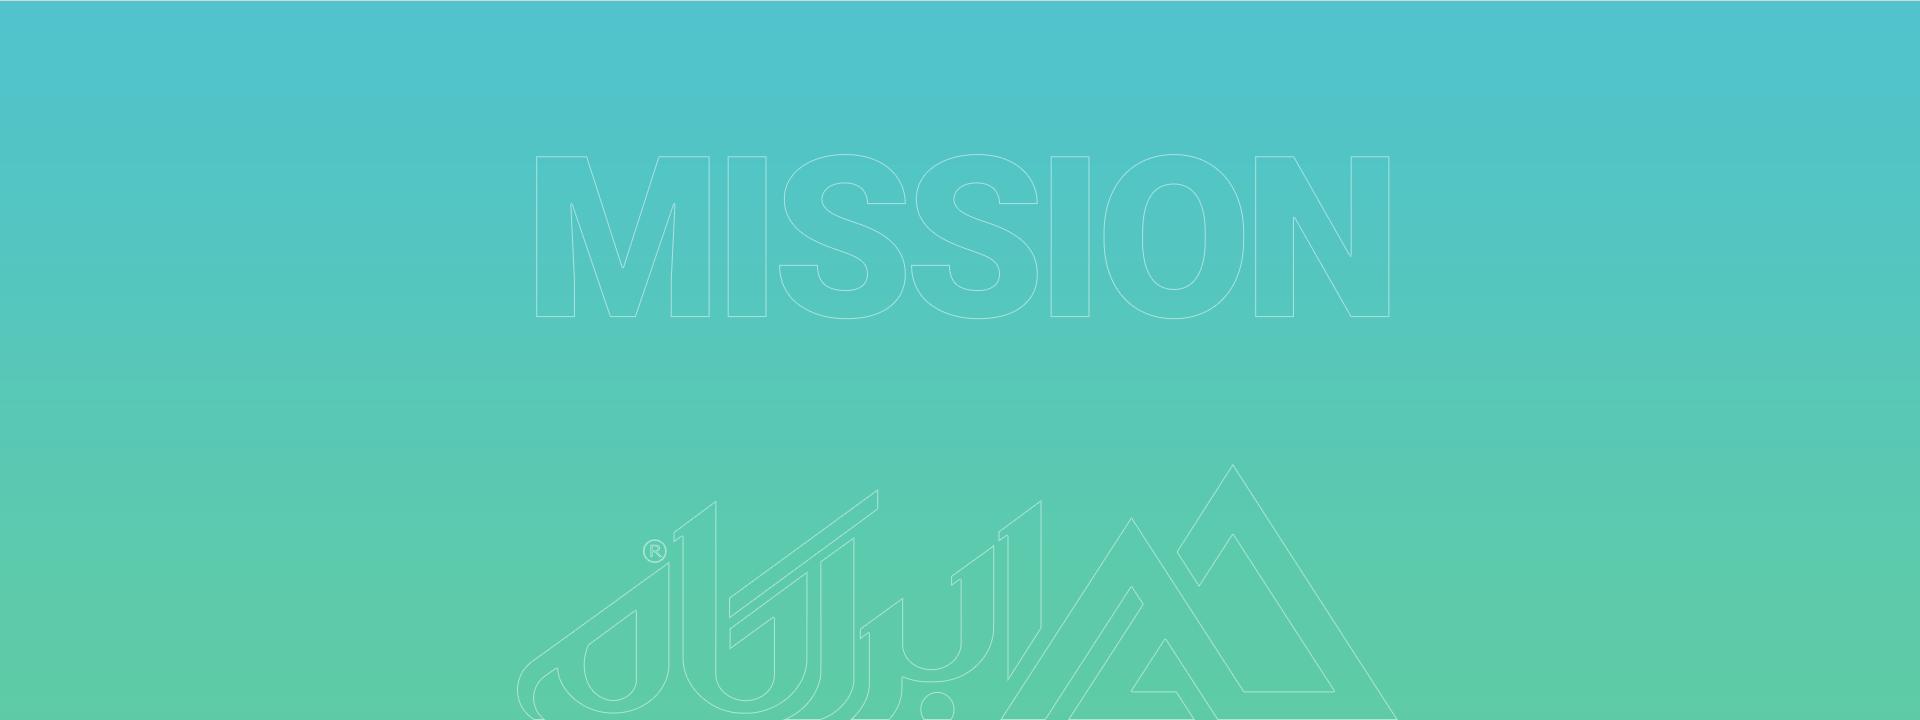 abtus-mission